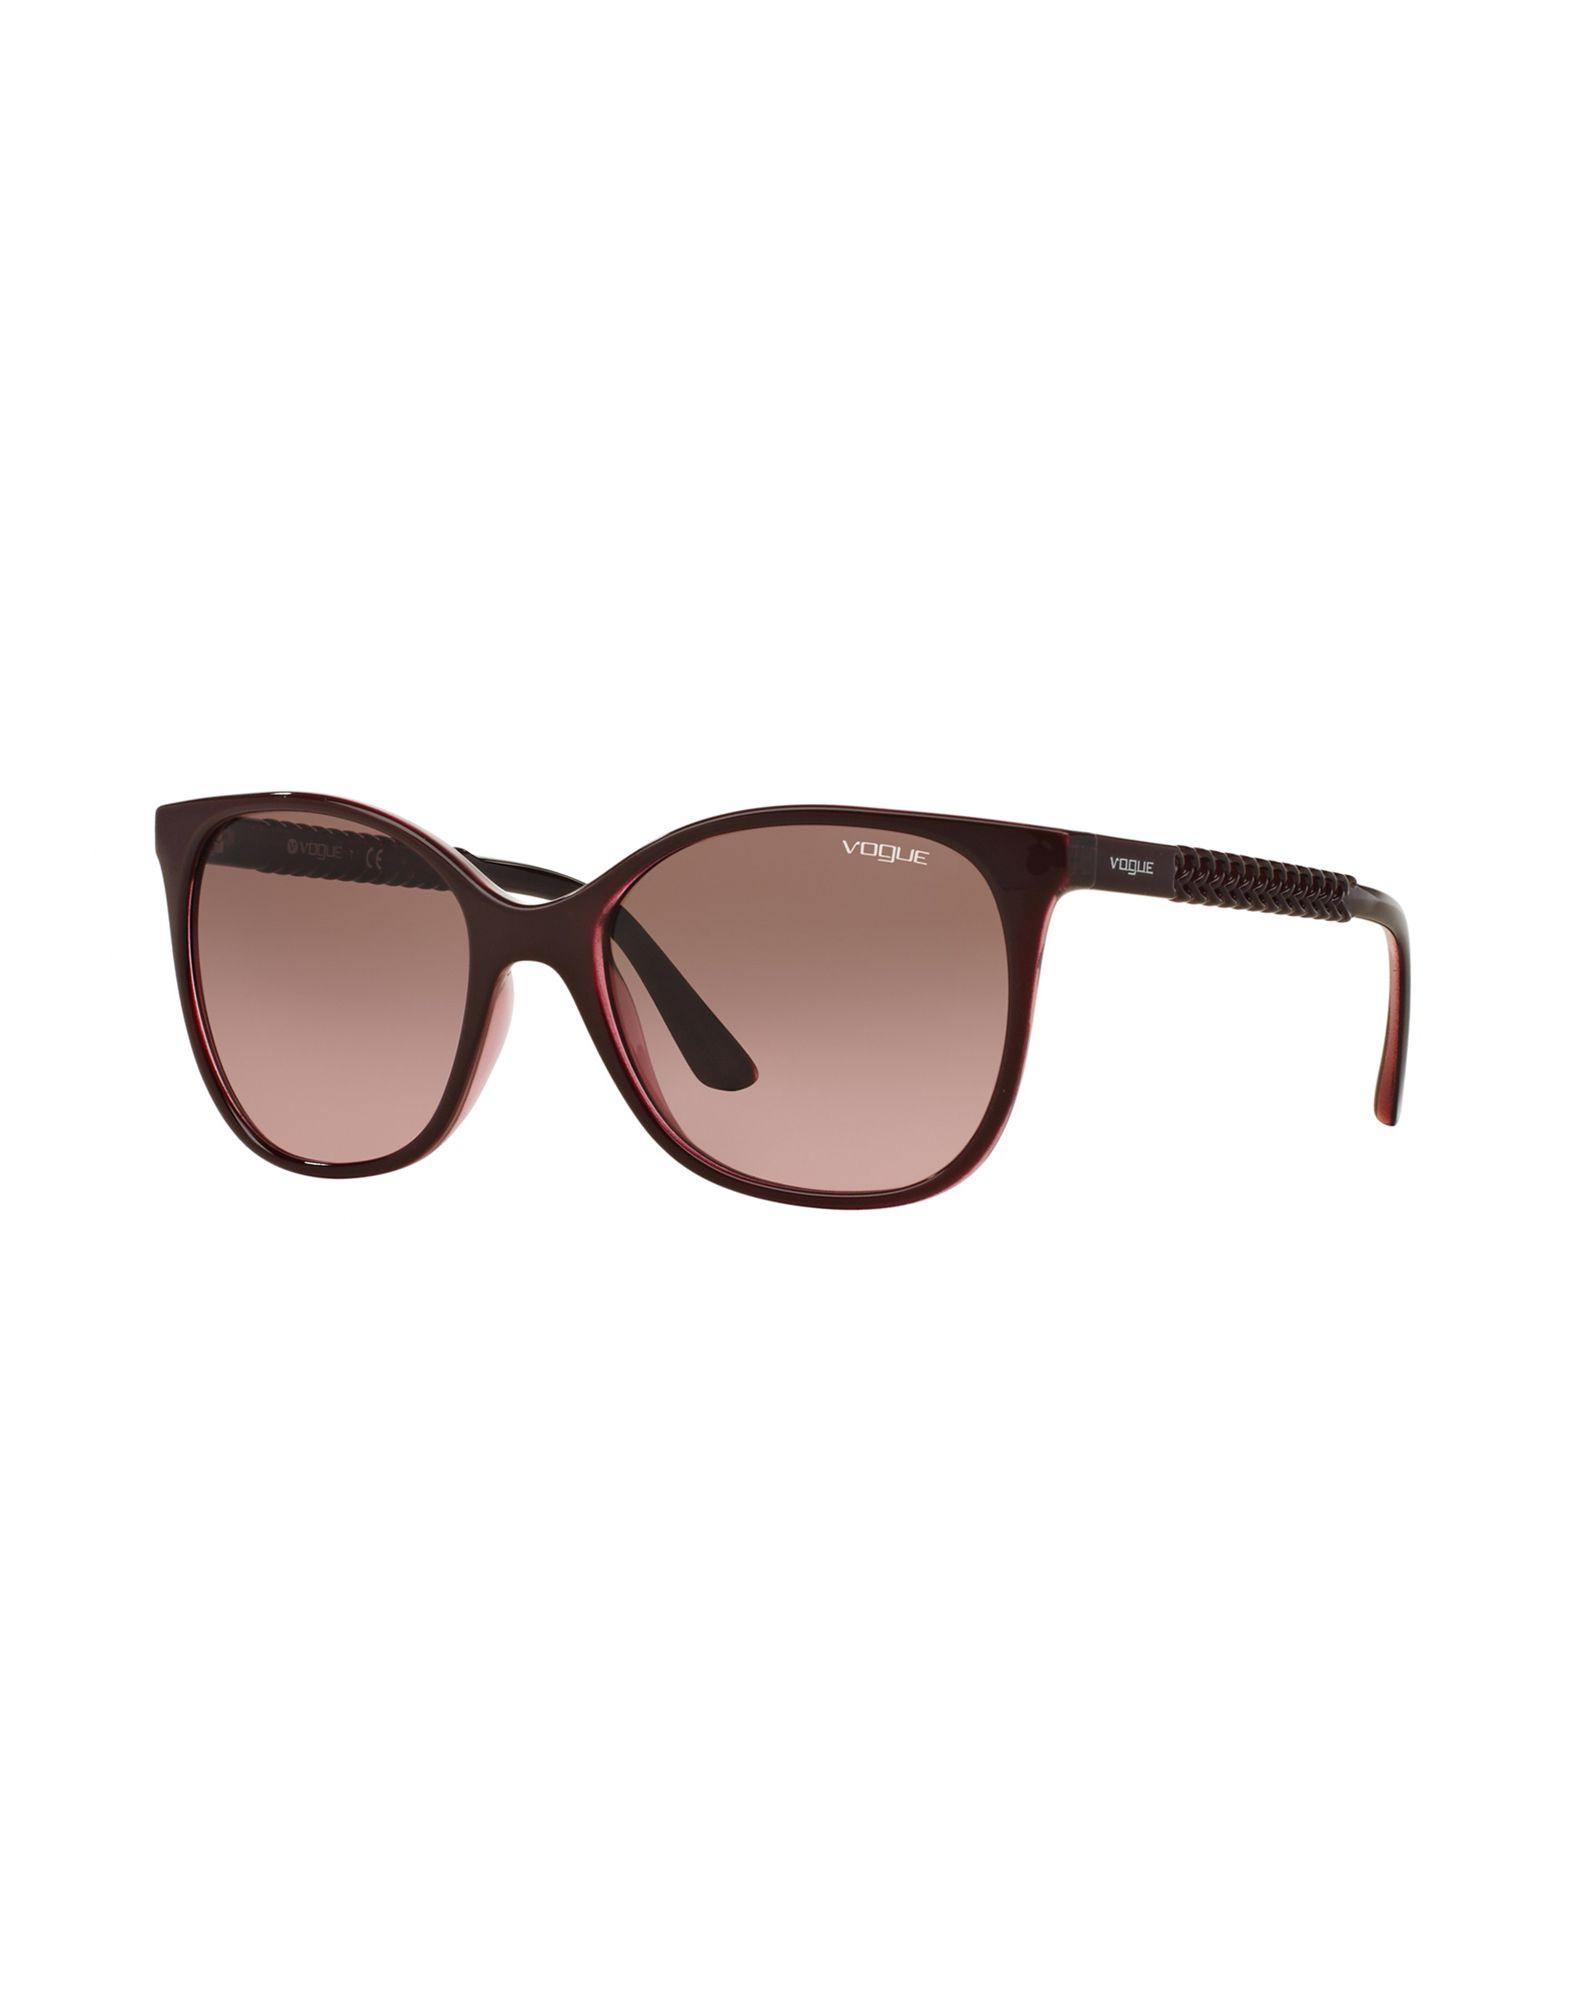 5f9ae64635 Γυαλιά Ηλίου Vogue Vo5032s - Γυναίκα - Γυαλιά Ηλίου Vogue στο YOOX -  46468758JP